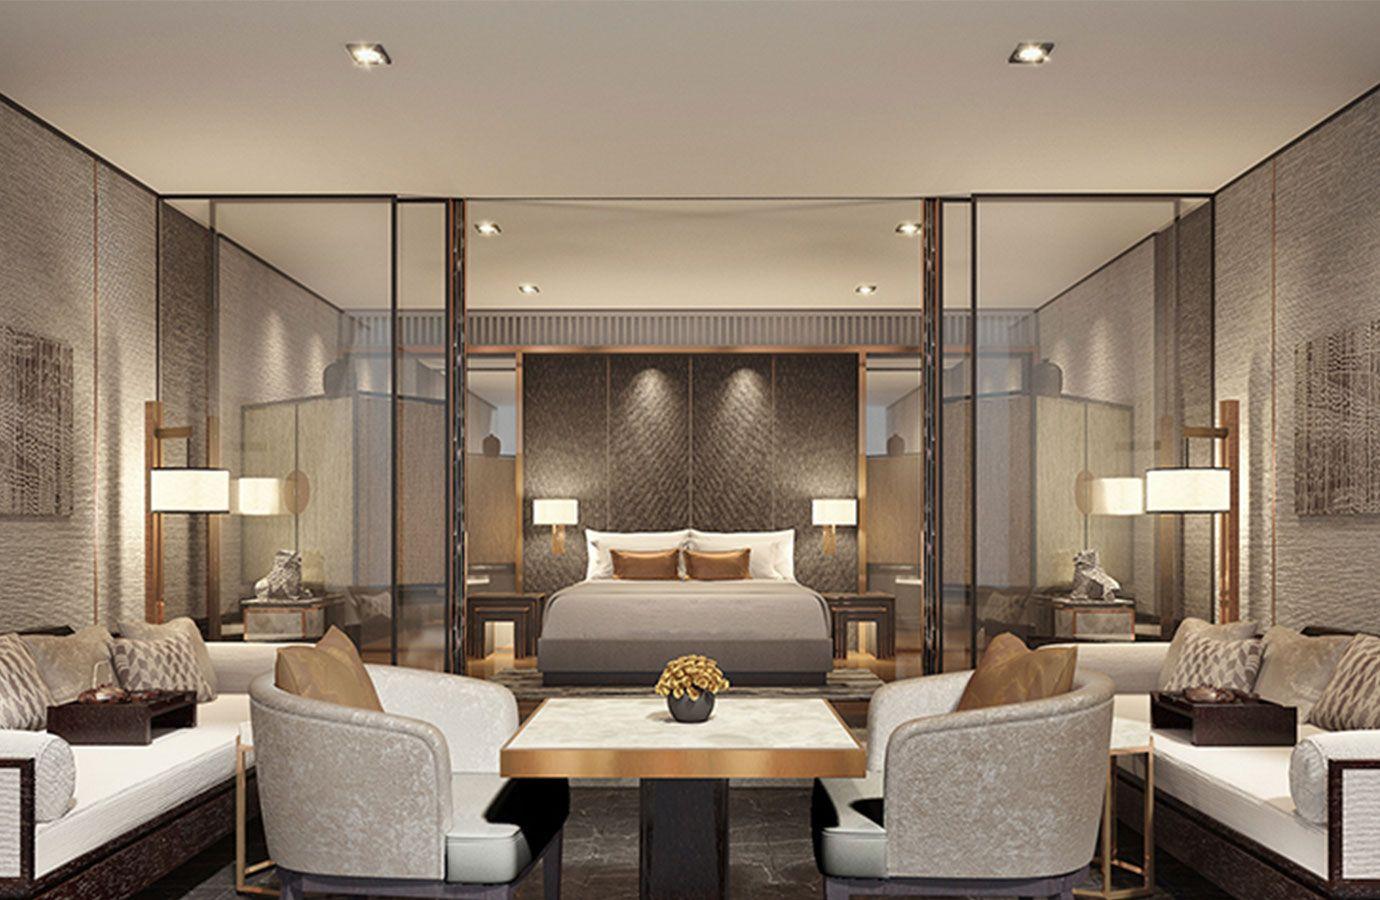 Regent xi an blink asia born internationally for Guest room interior design